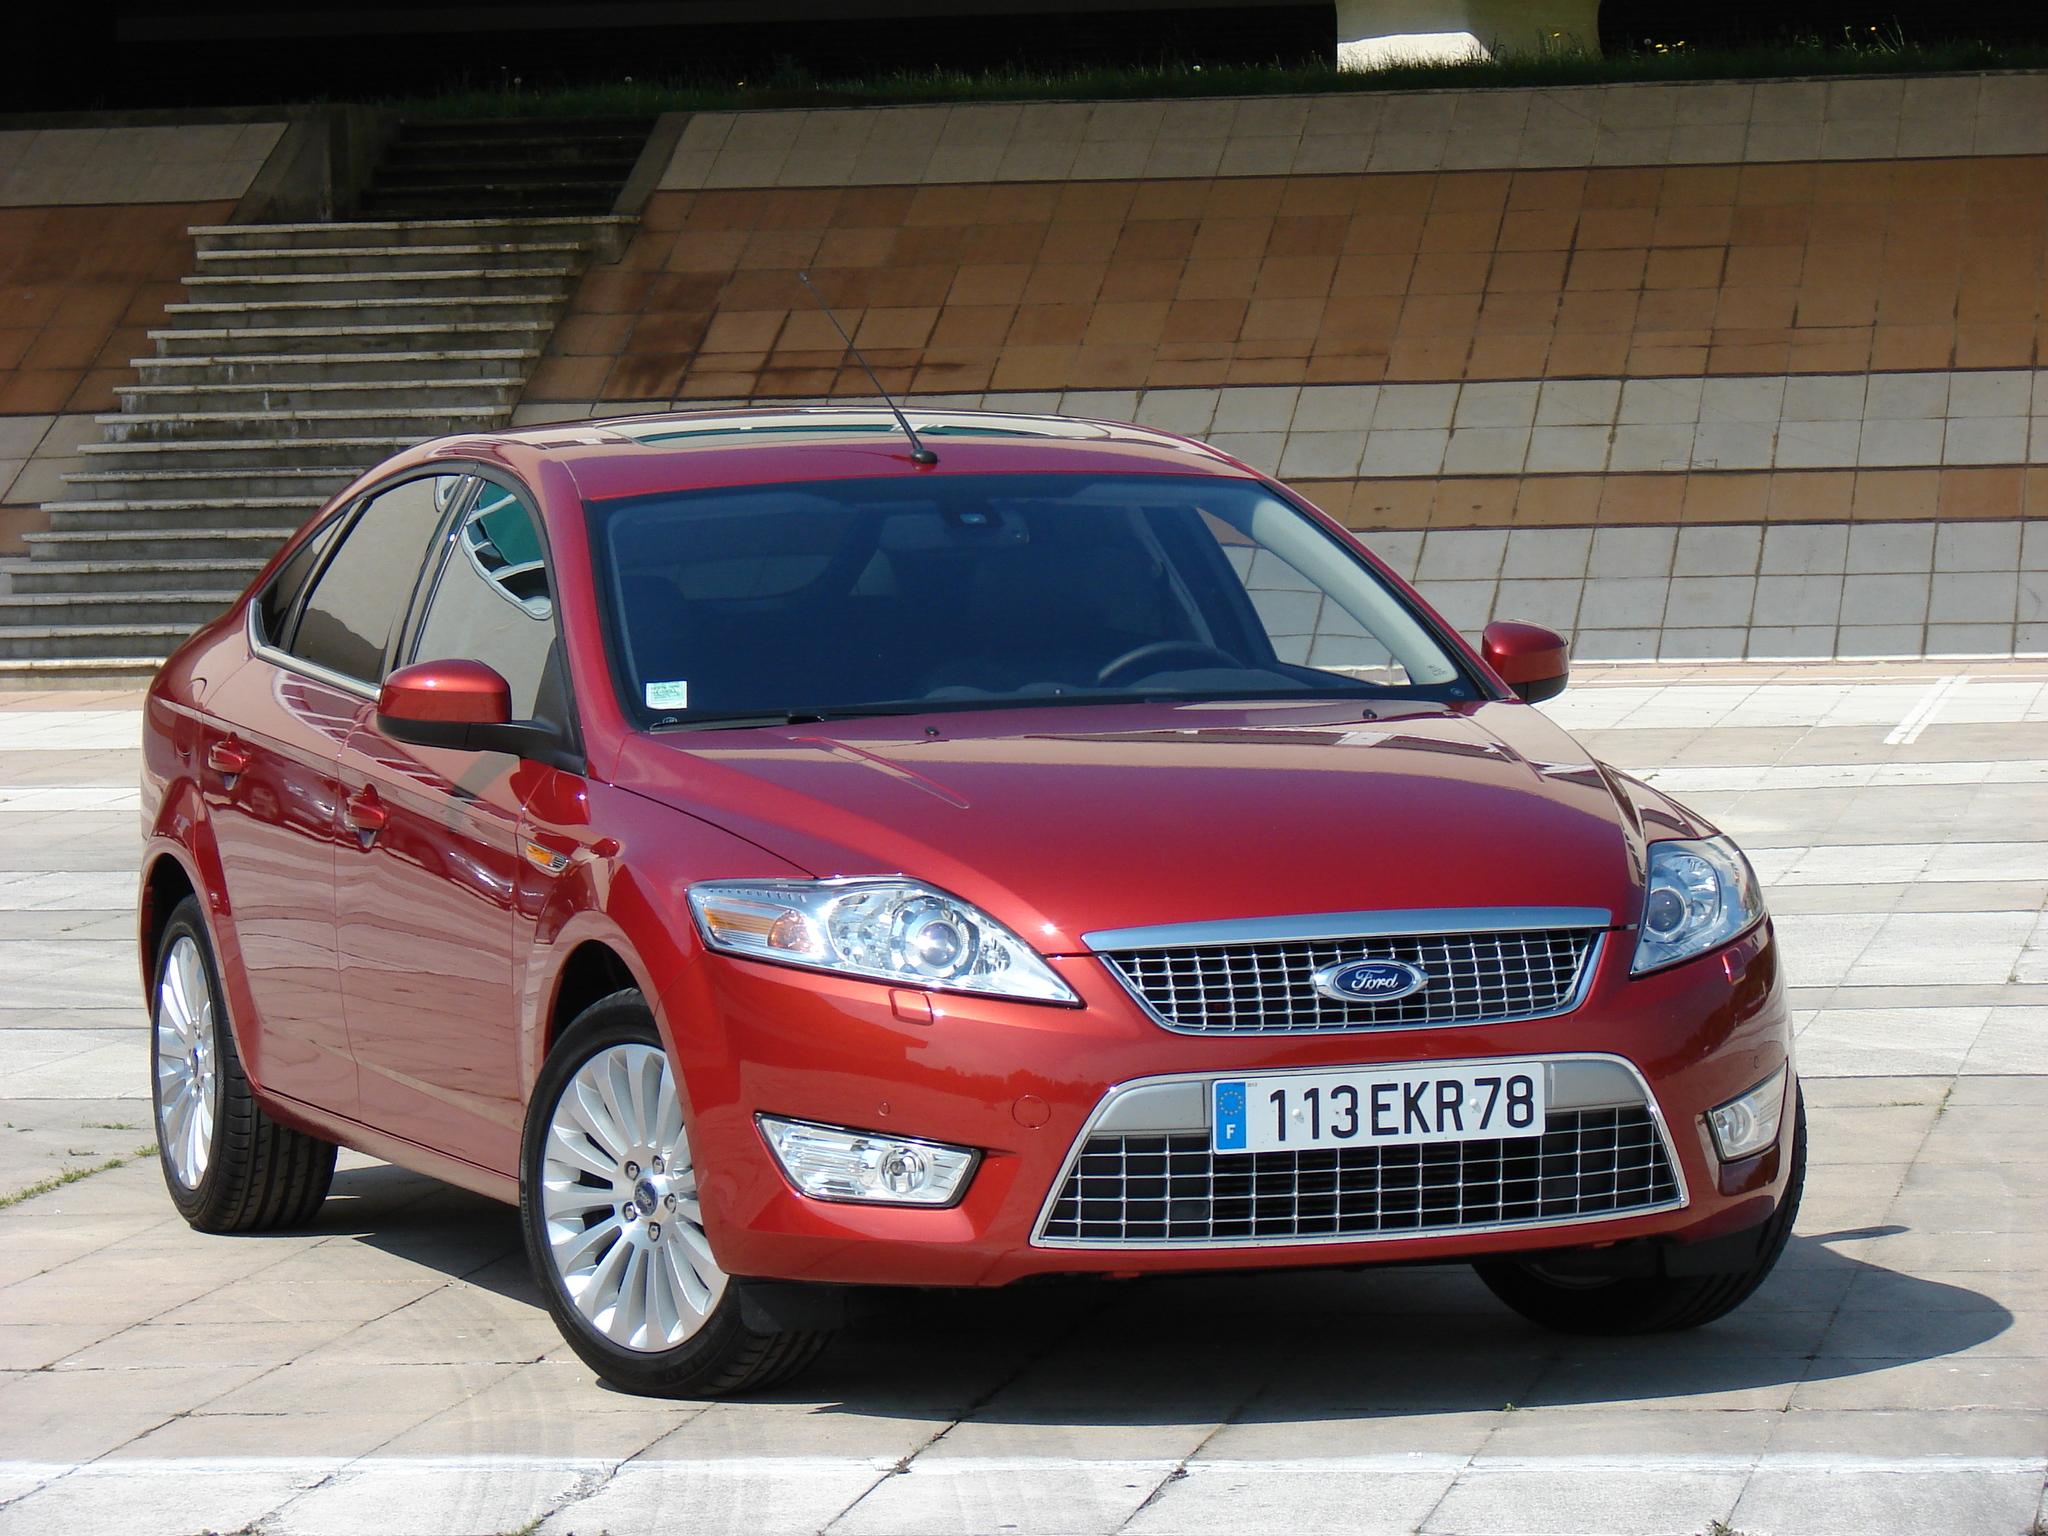 Технические характеристики Форд Мондео 2013, клиренс, фото ...